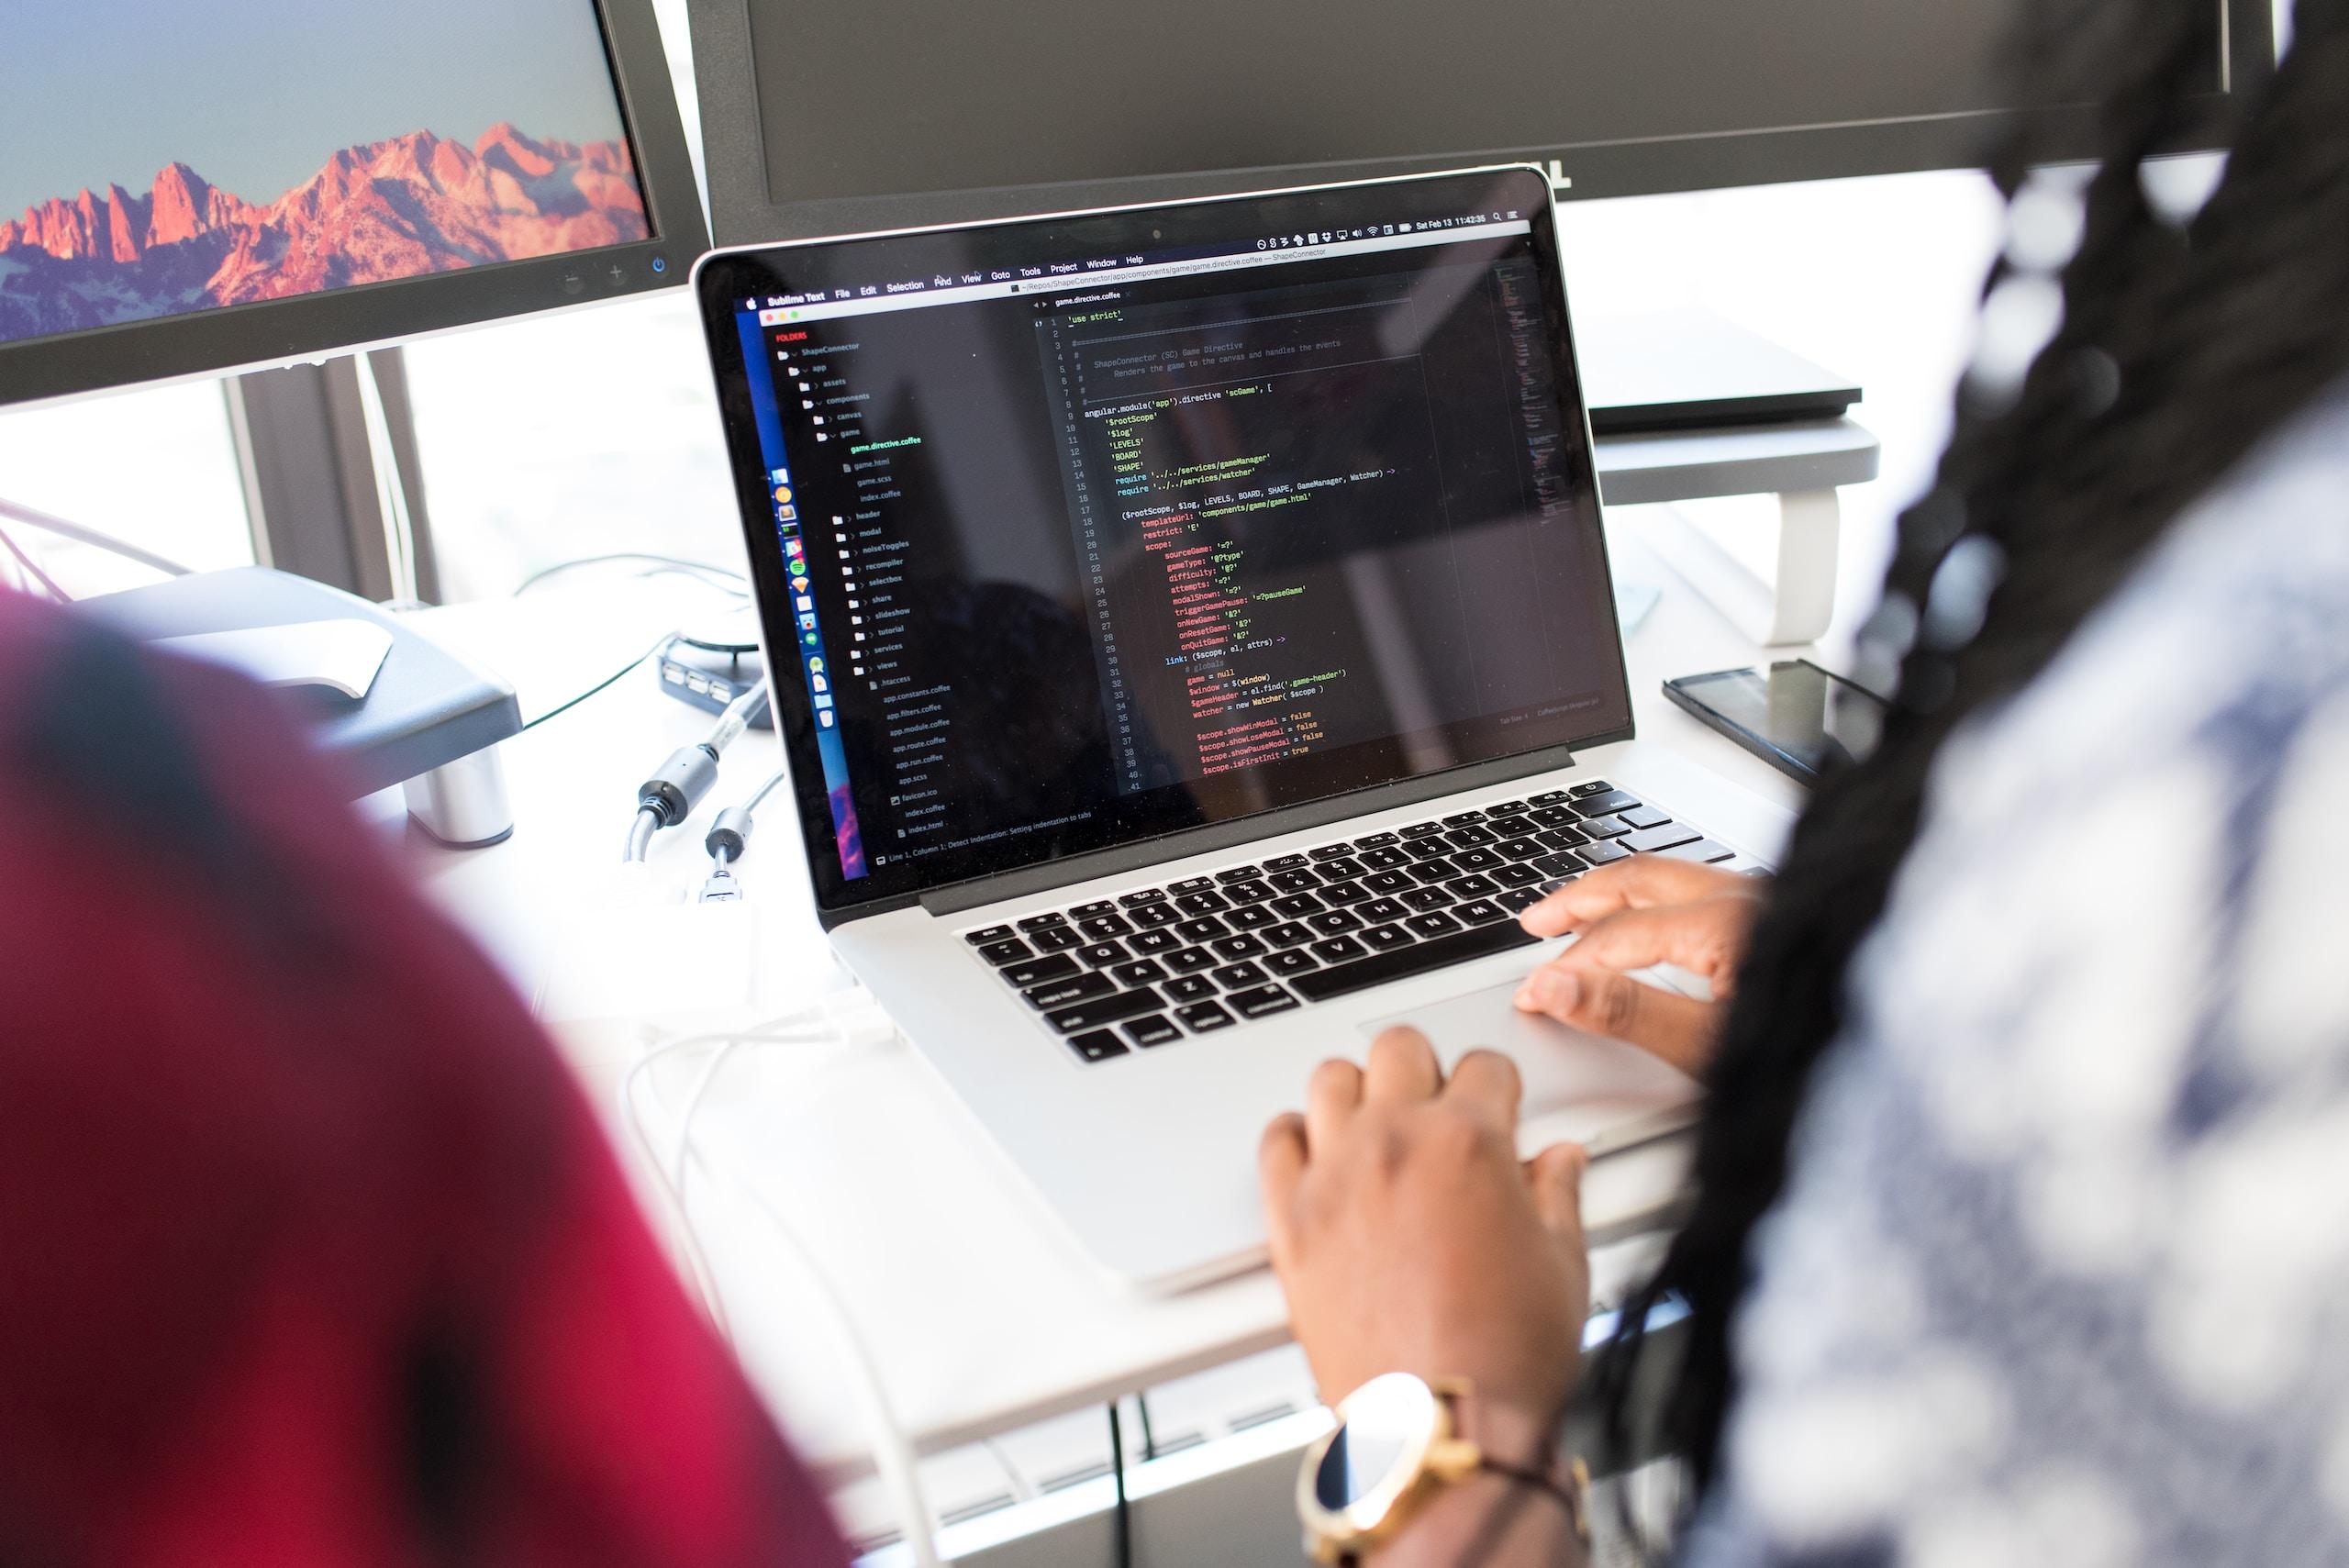 desenvolvimento web designer web designer - photo 1573496773905 f5b17e717f05 ixid MnwyMjQzNzR8MHwxfGFsbHx8fHx8fHx8fDE2MTg4MDI4NzI ixlib rb 1 - Web Designer X Desenvolvedor Web: saiba as diferenças